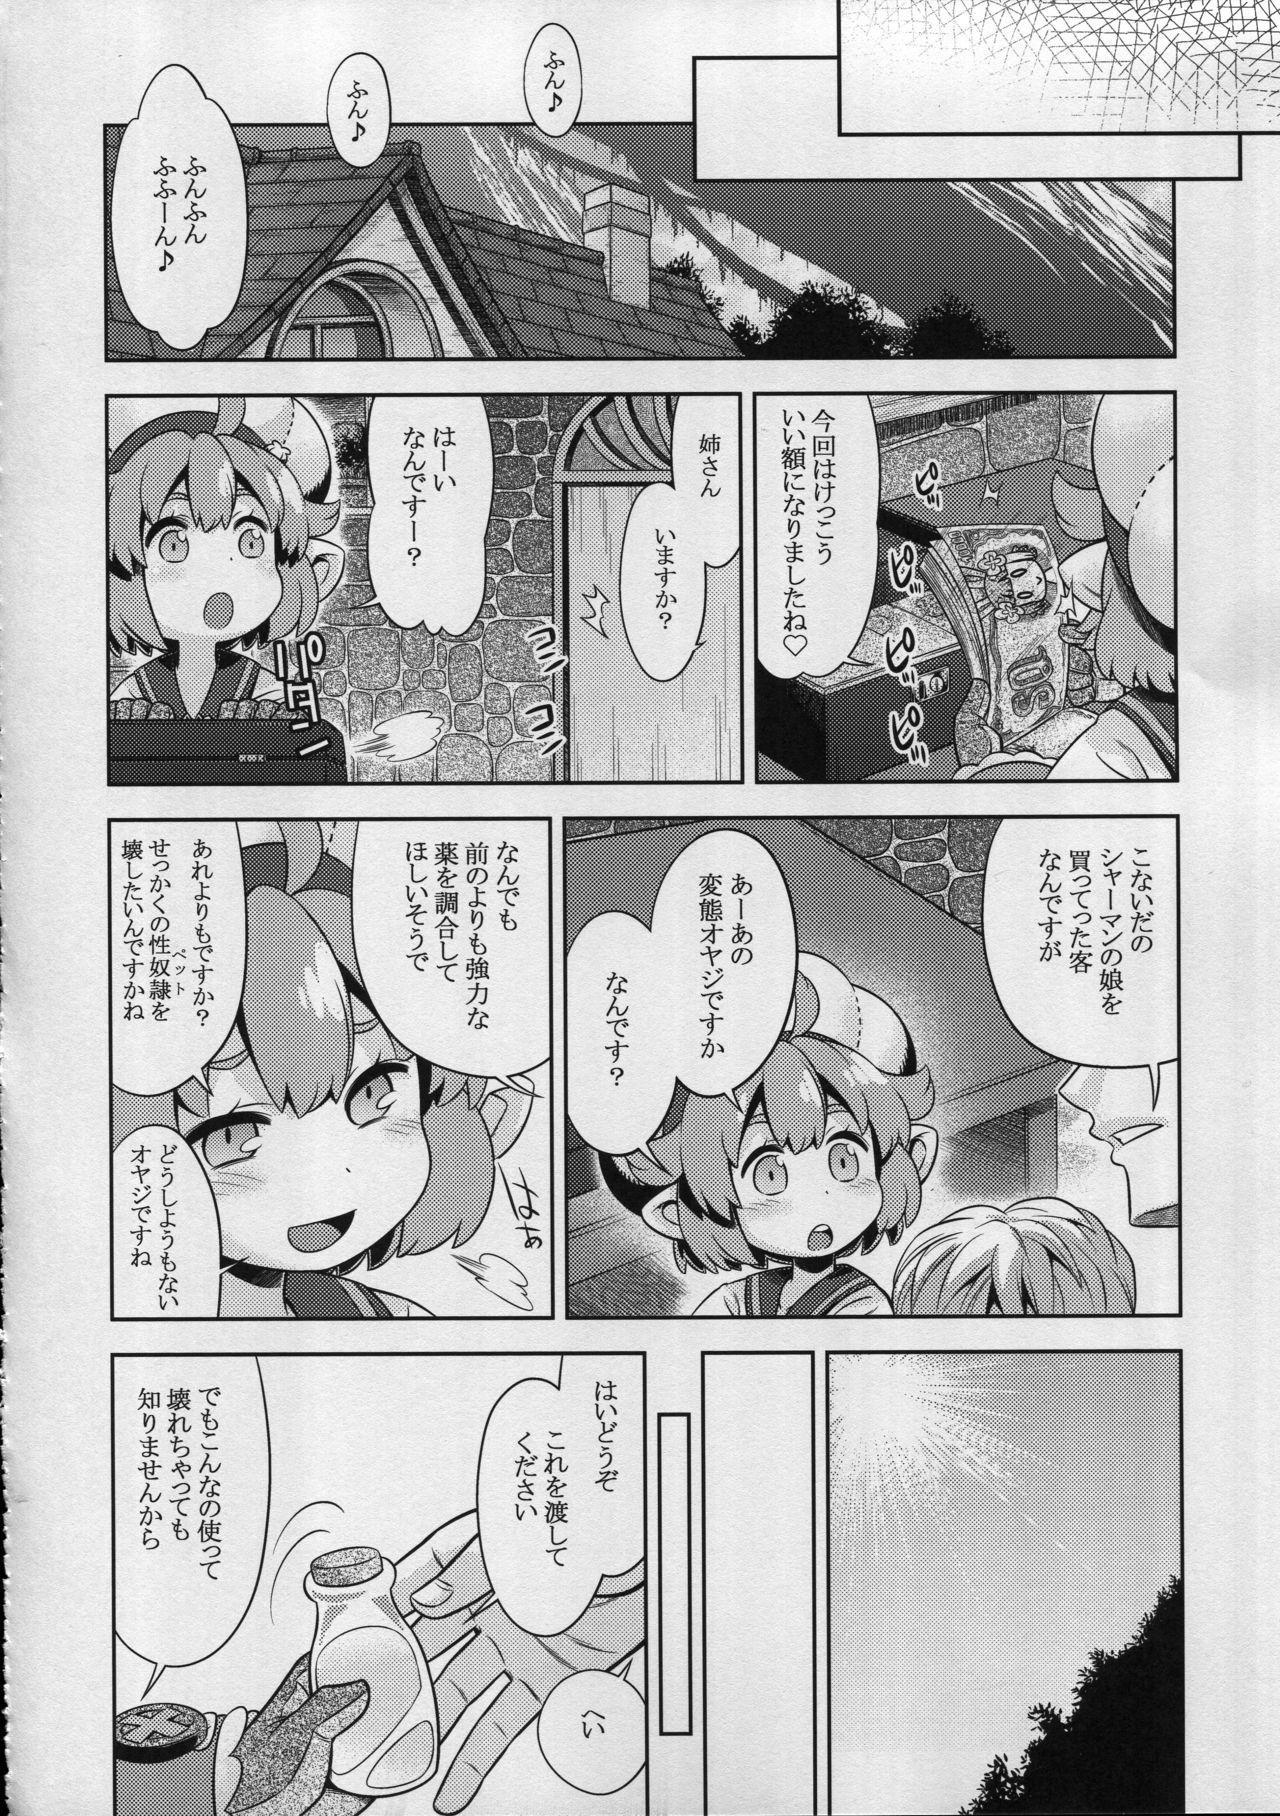 Sekaiju no Anone 28 Kouhen 29